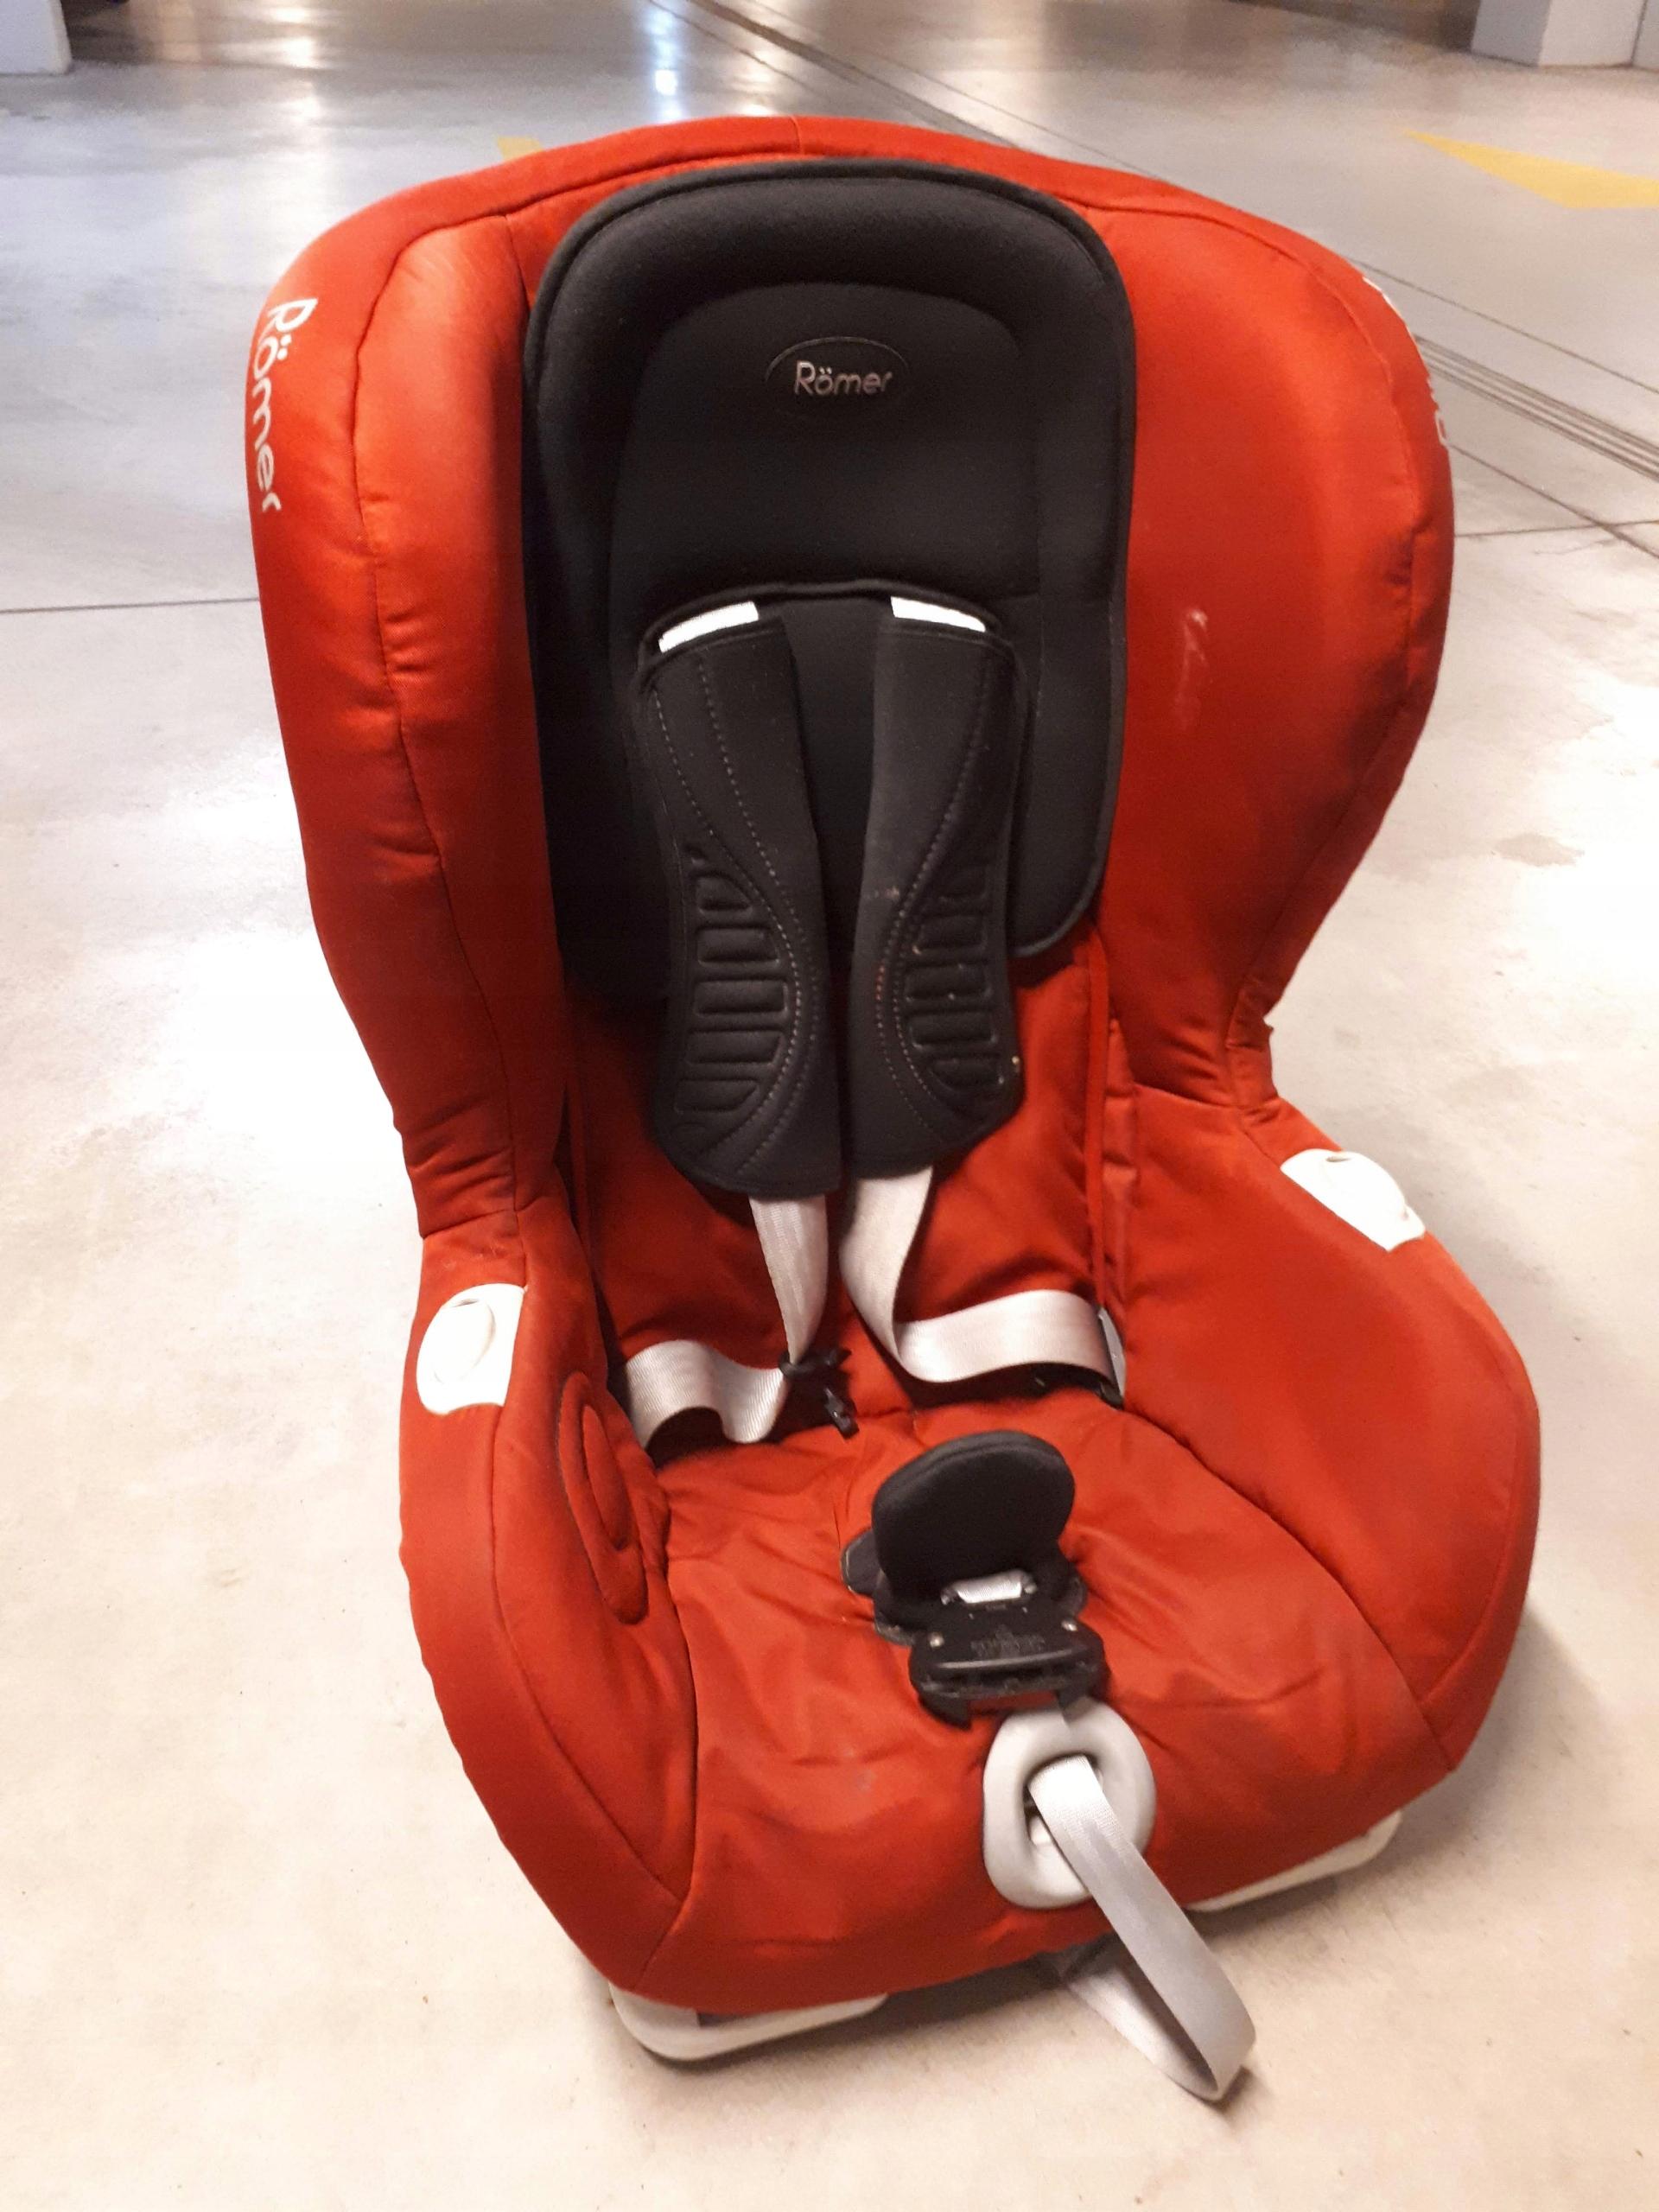 Romer Versafix 9-18 kg fotelik dla dziecka ISOFIX